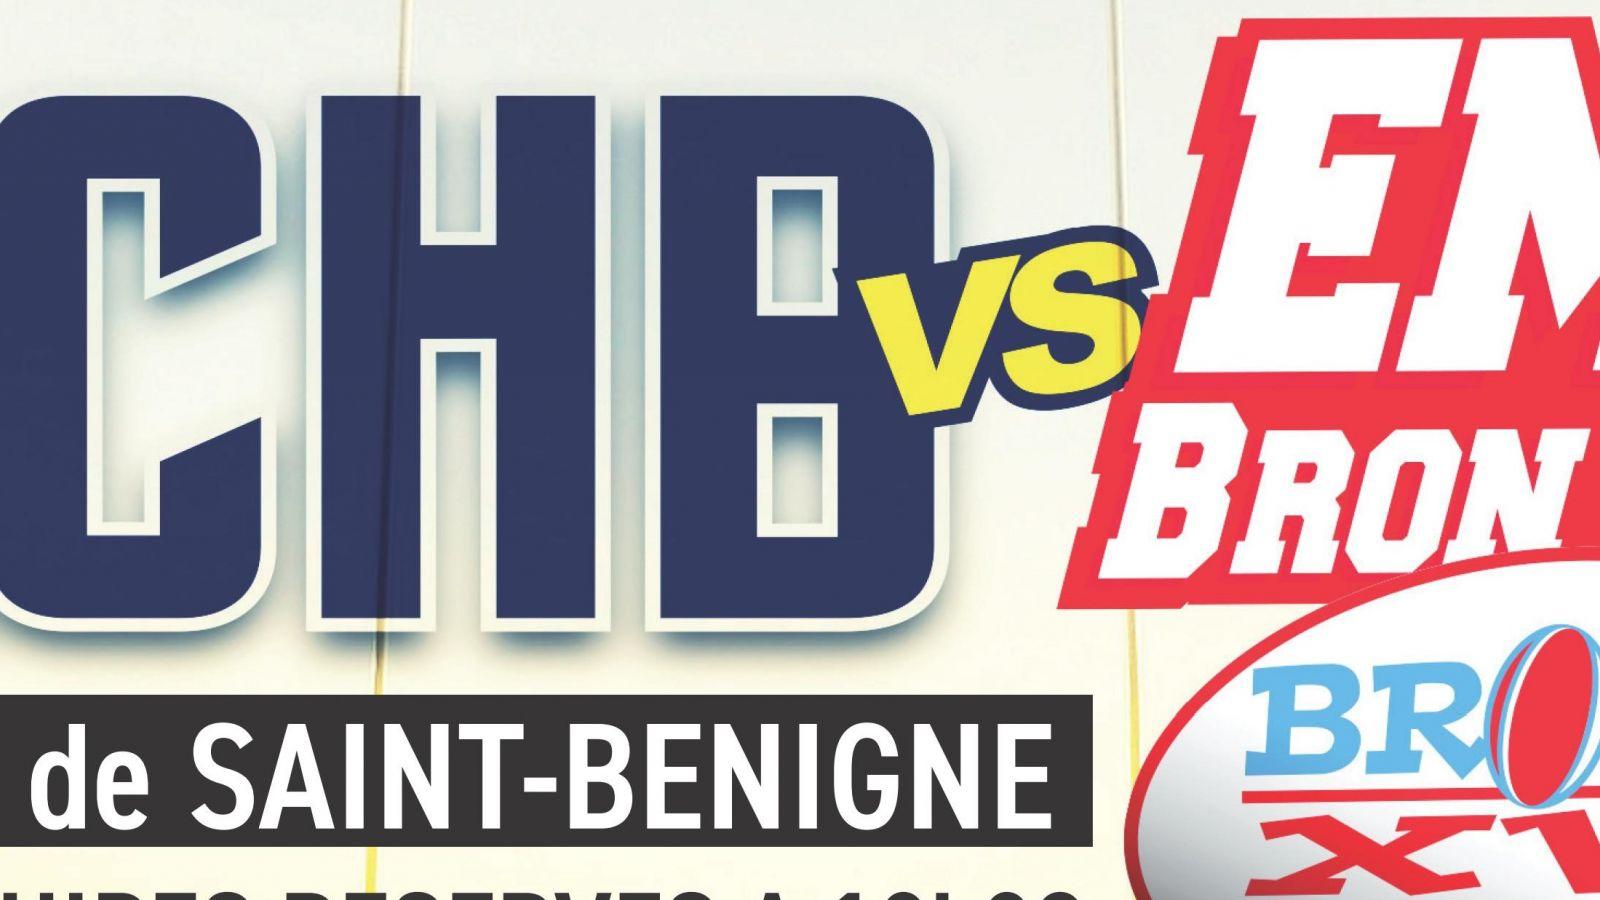 Dimanche 17 novembre 2019, Bassin RCHB vs EMS Bron